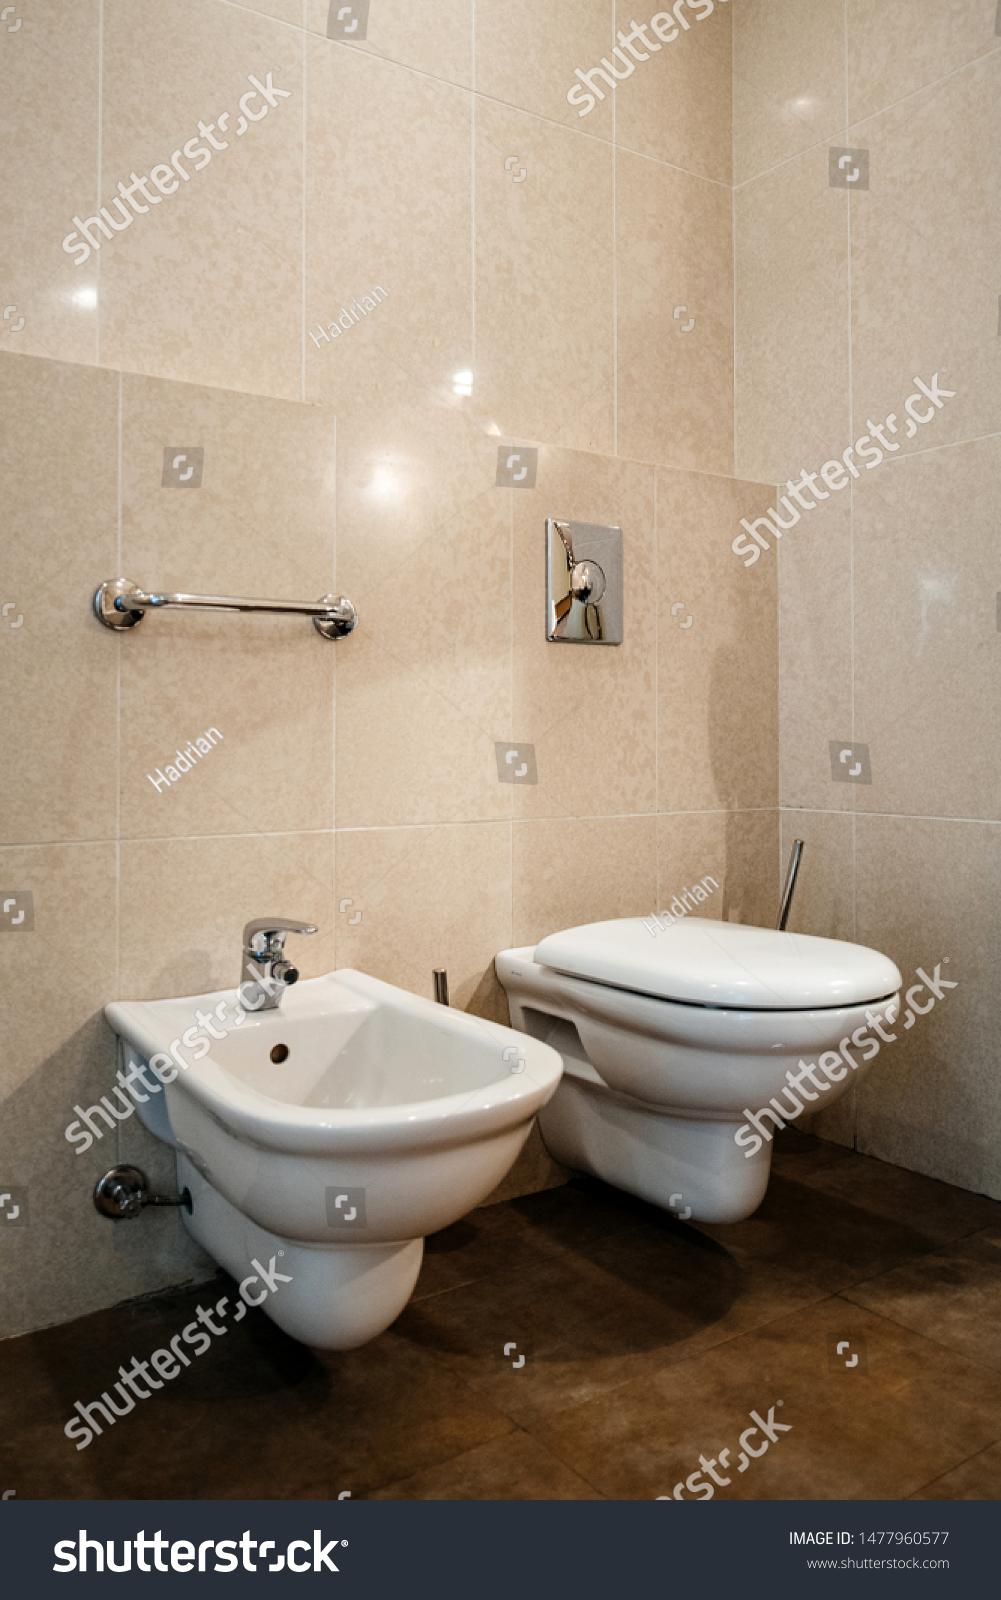 Interior Five Star Hotel Large Bathroom Stock Photo Edit Now 1477960577